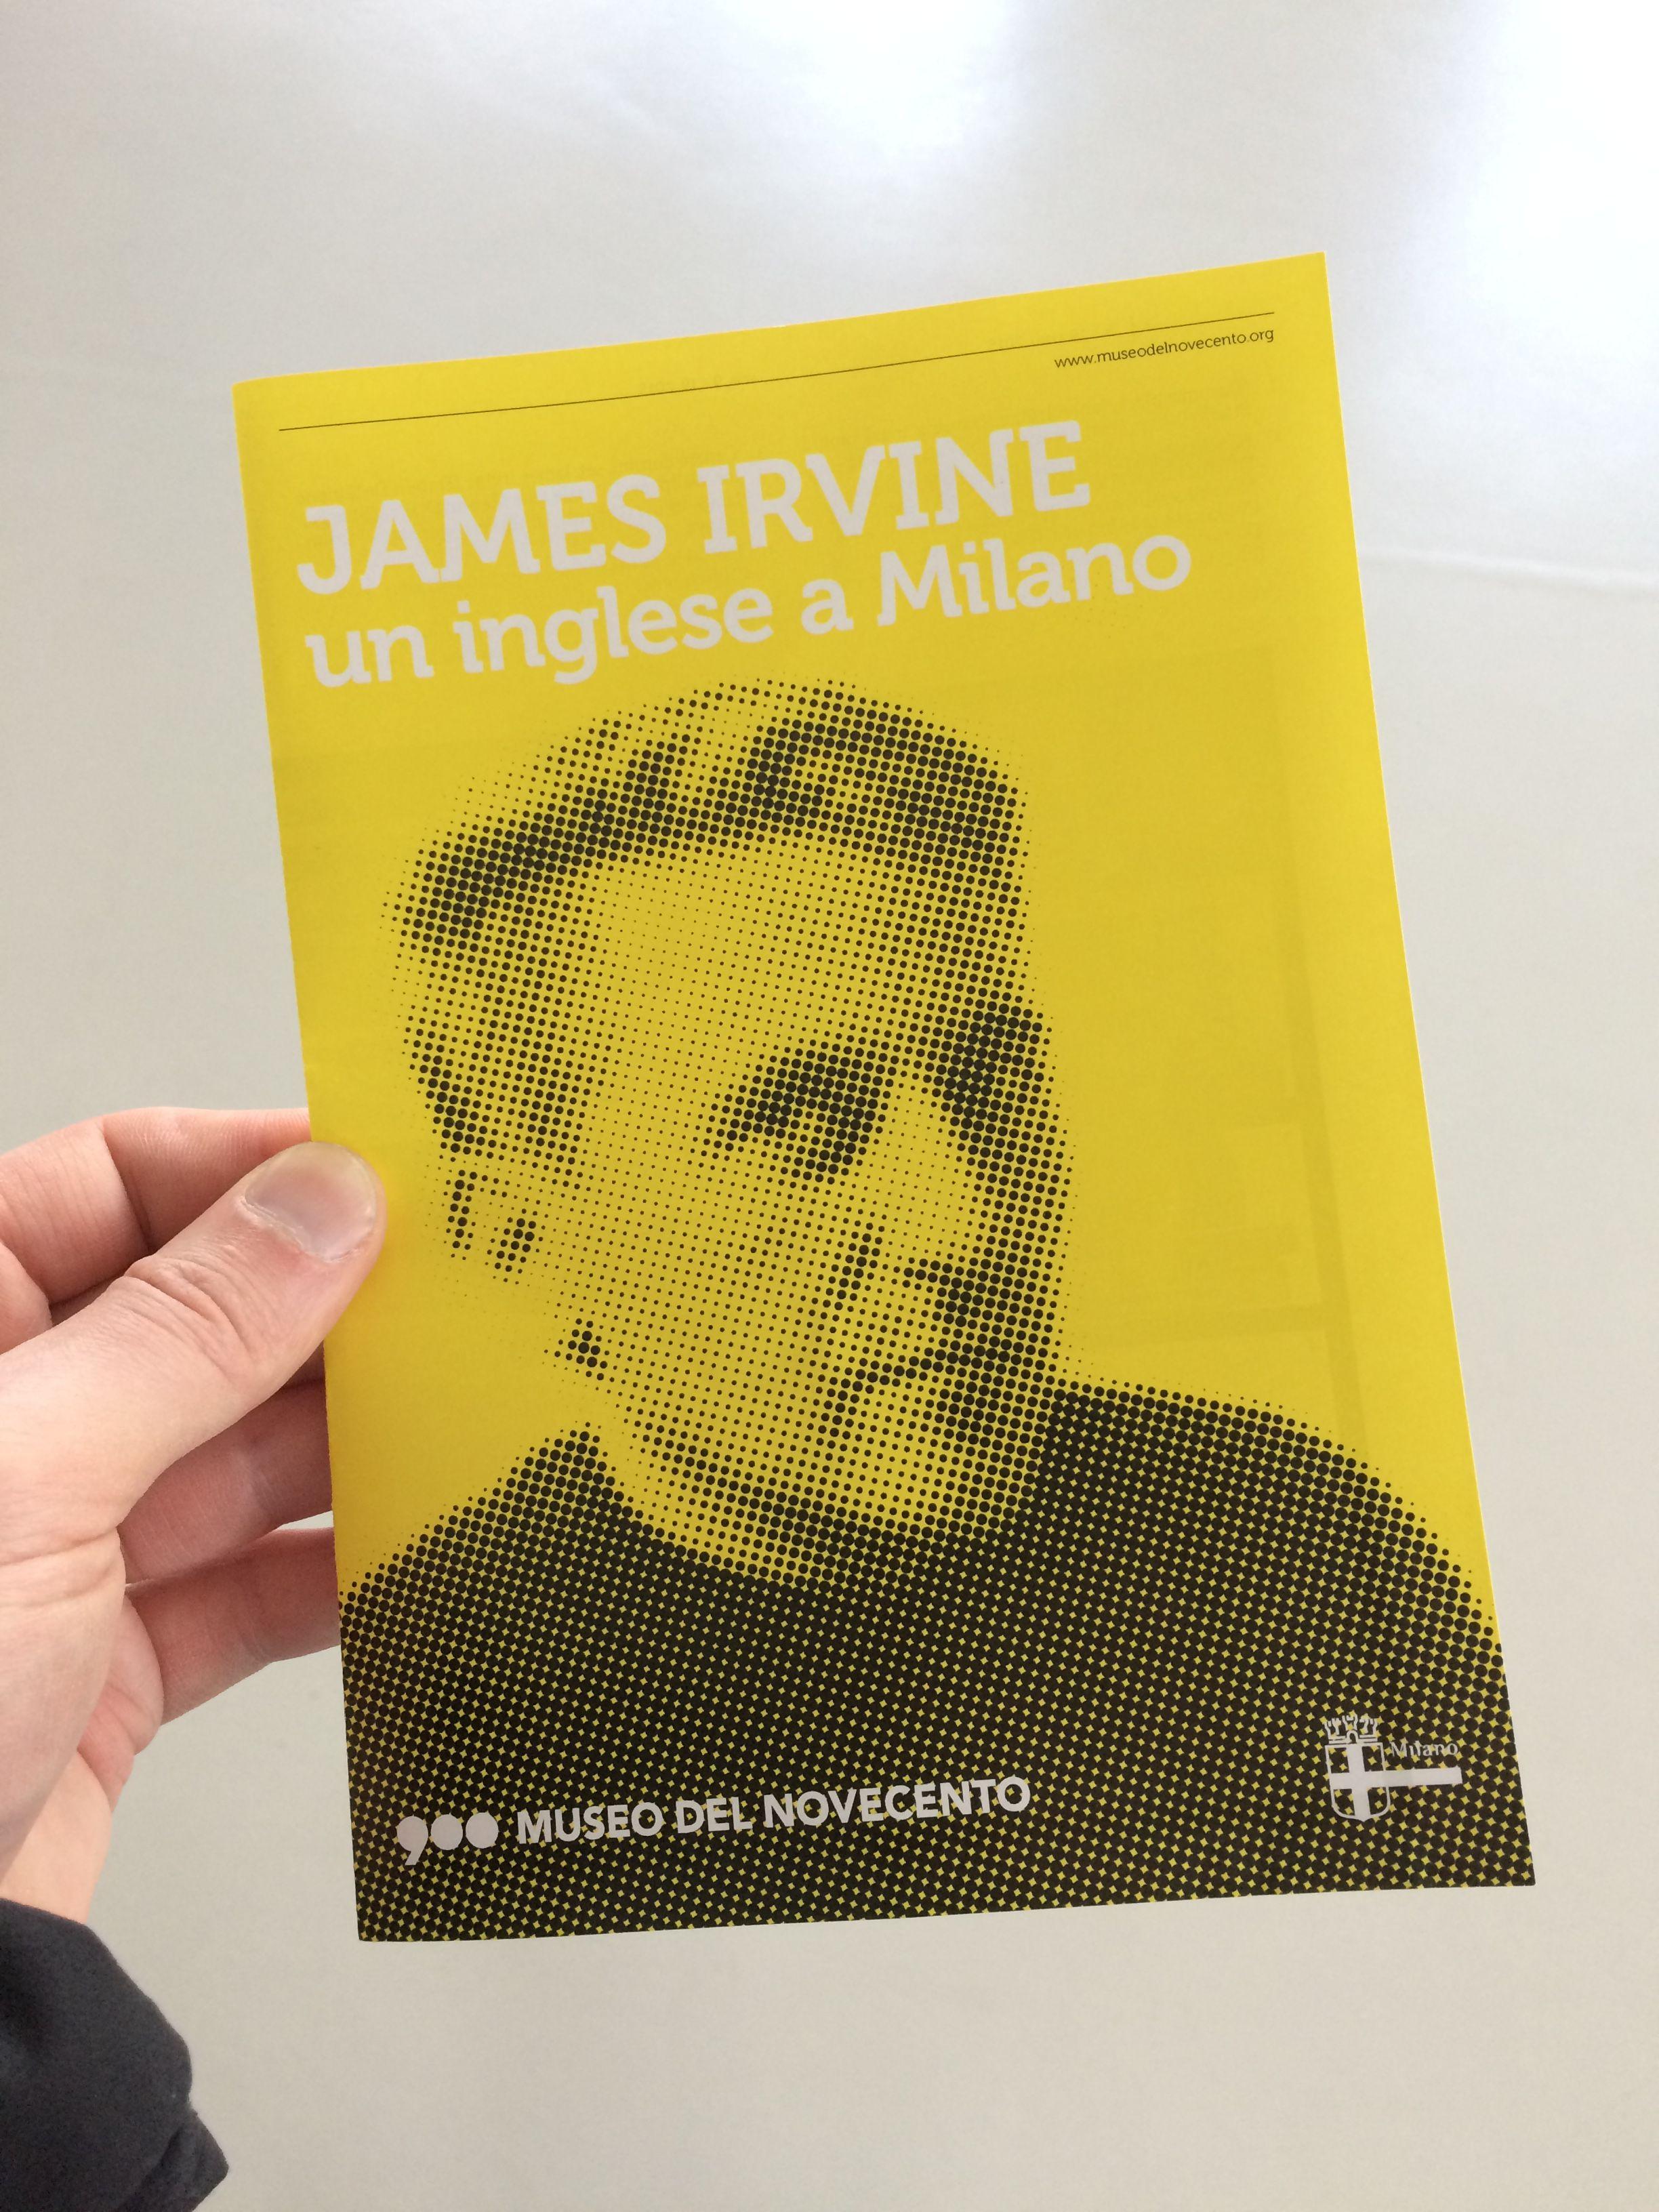 """James Irvine un inglese a Milano"" 9 – 19 APRILE 2015 Museo del Novecento Milano I – Sala Focus James Irvine"